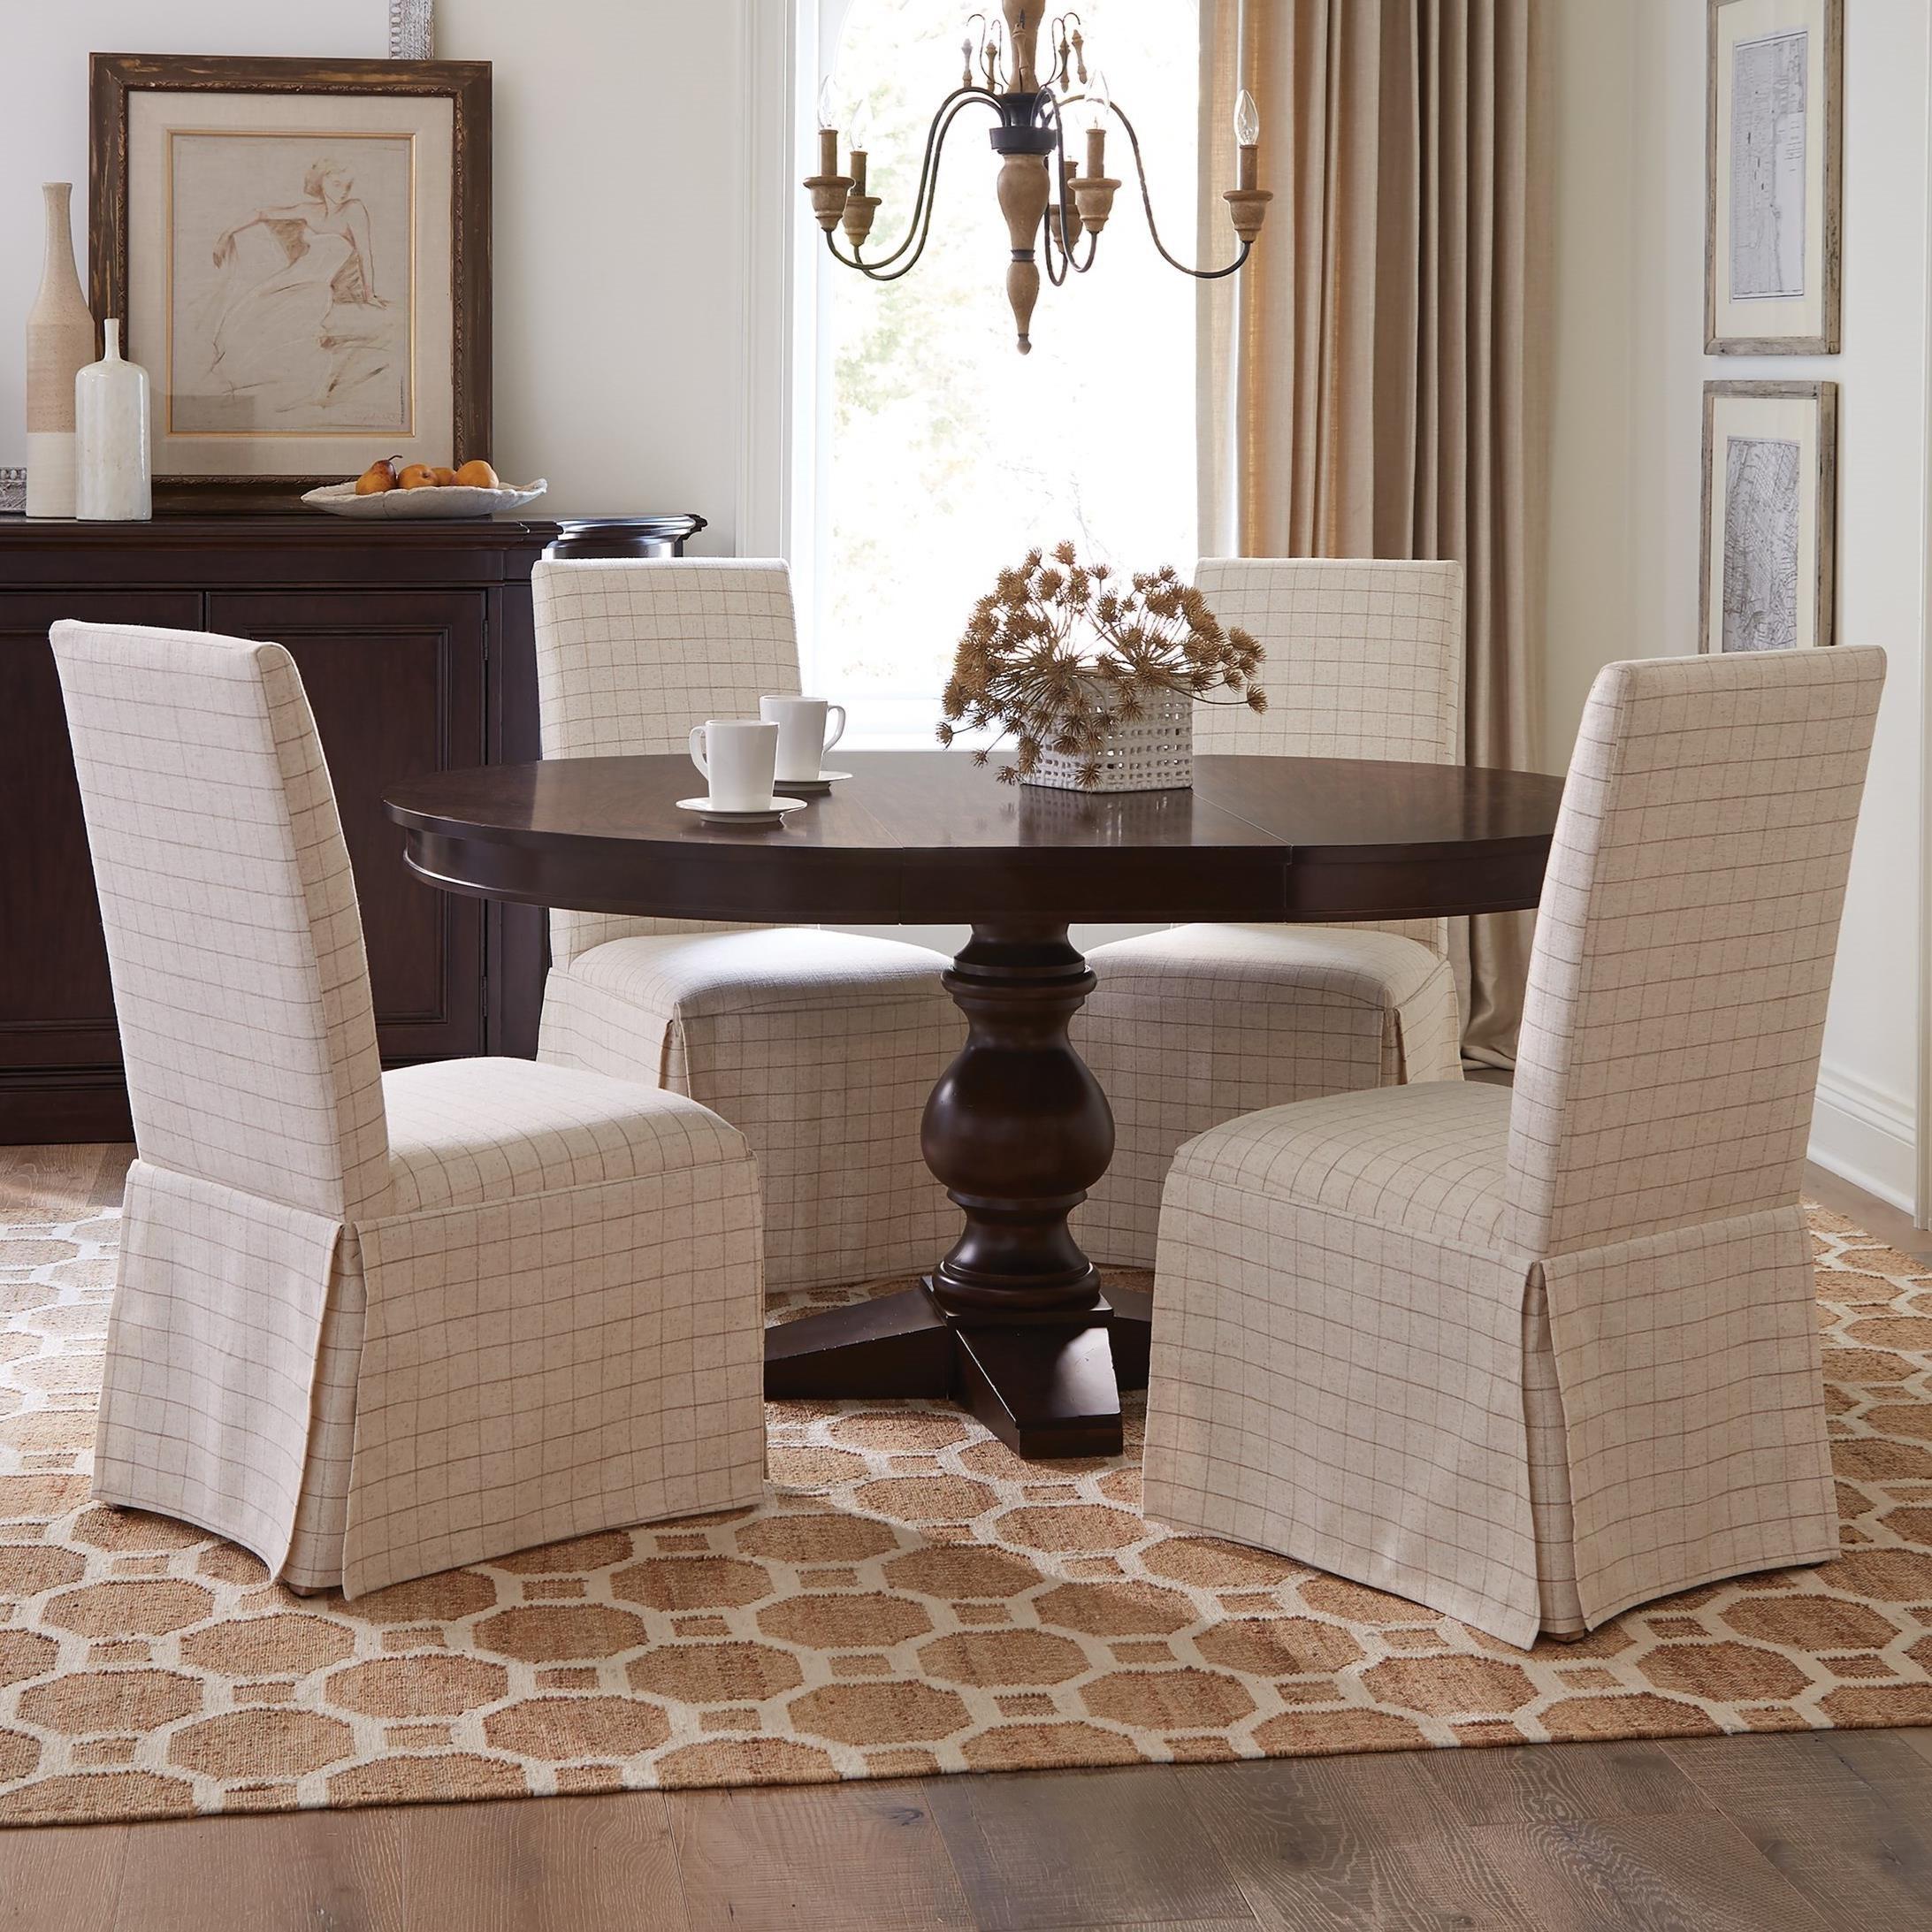 Rosemoor 5-Piece Round Dining Table Set by Riverside Furniture at Mueller Furniture